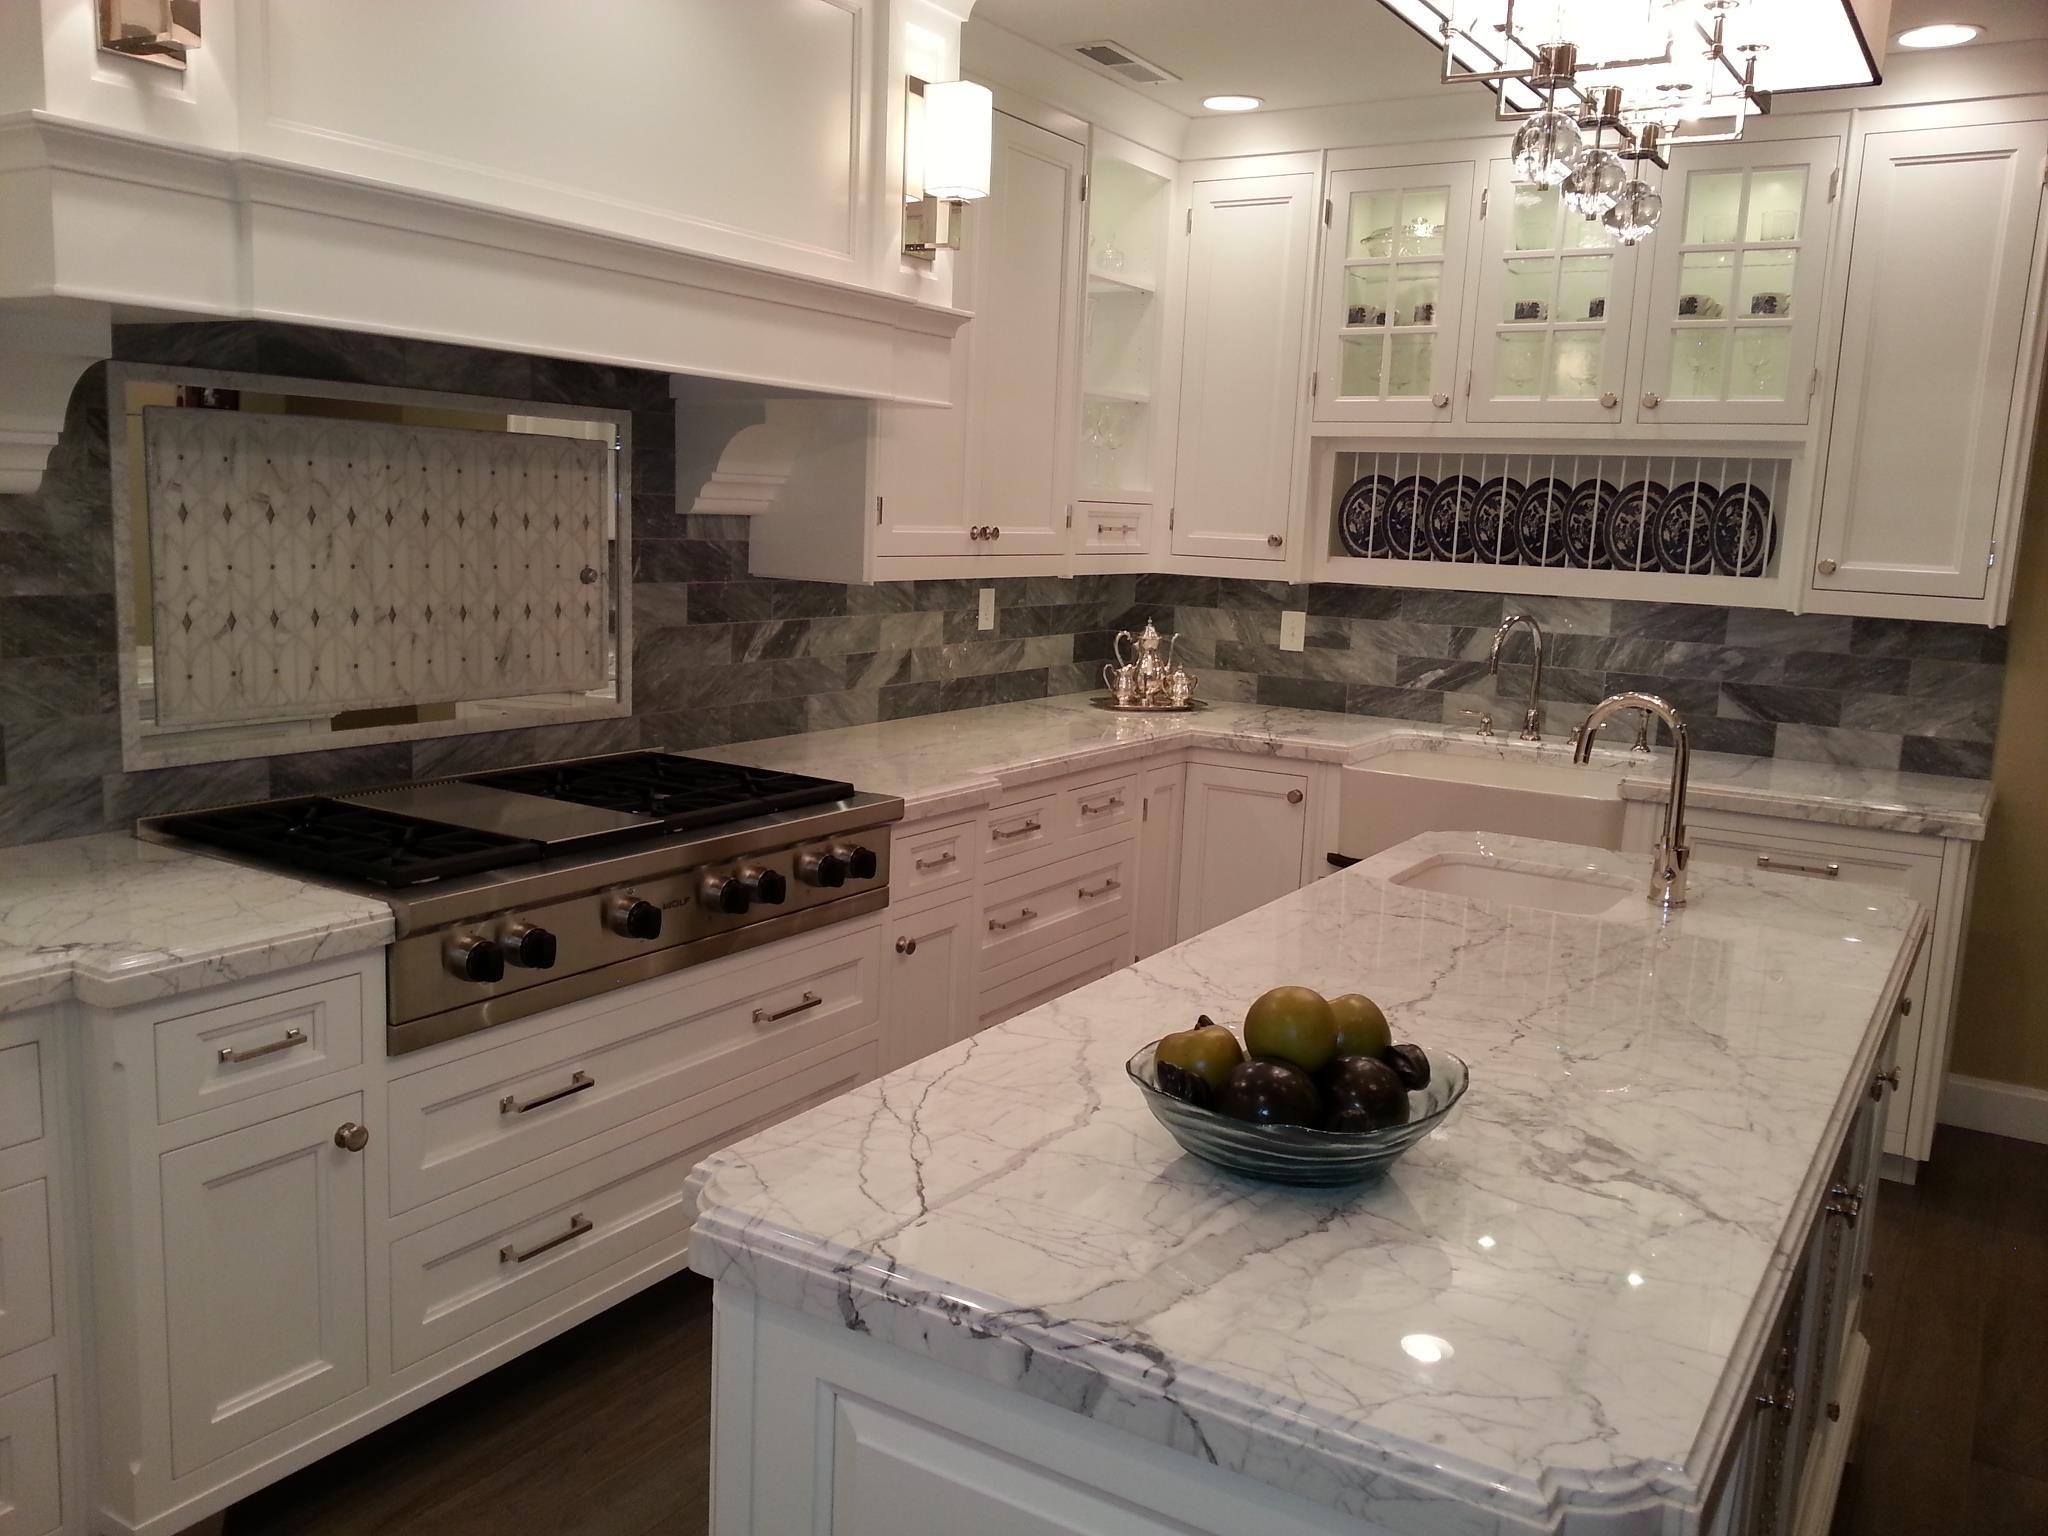 White Granite Countertops Google Search White Granite Countertops Kitchen Remodel Countertops Modern Kitchen Appliances